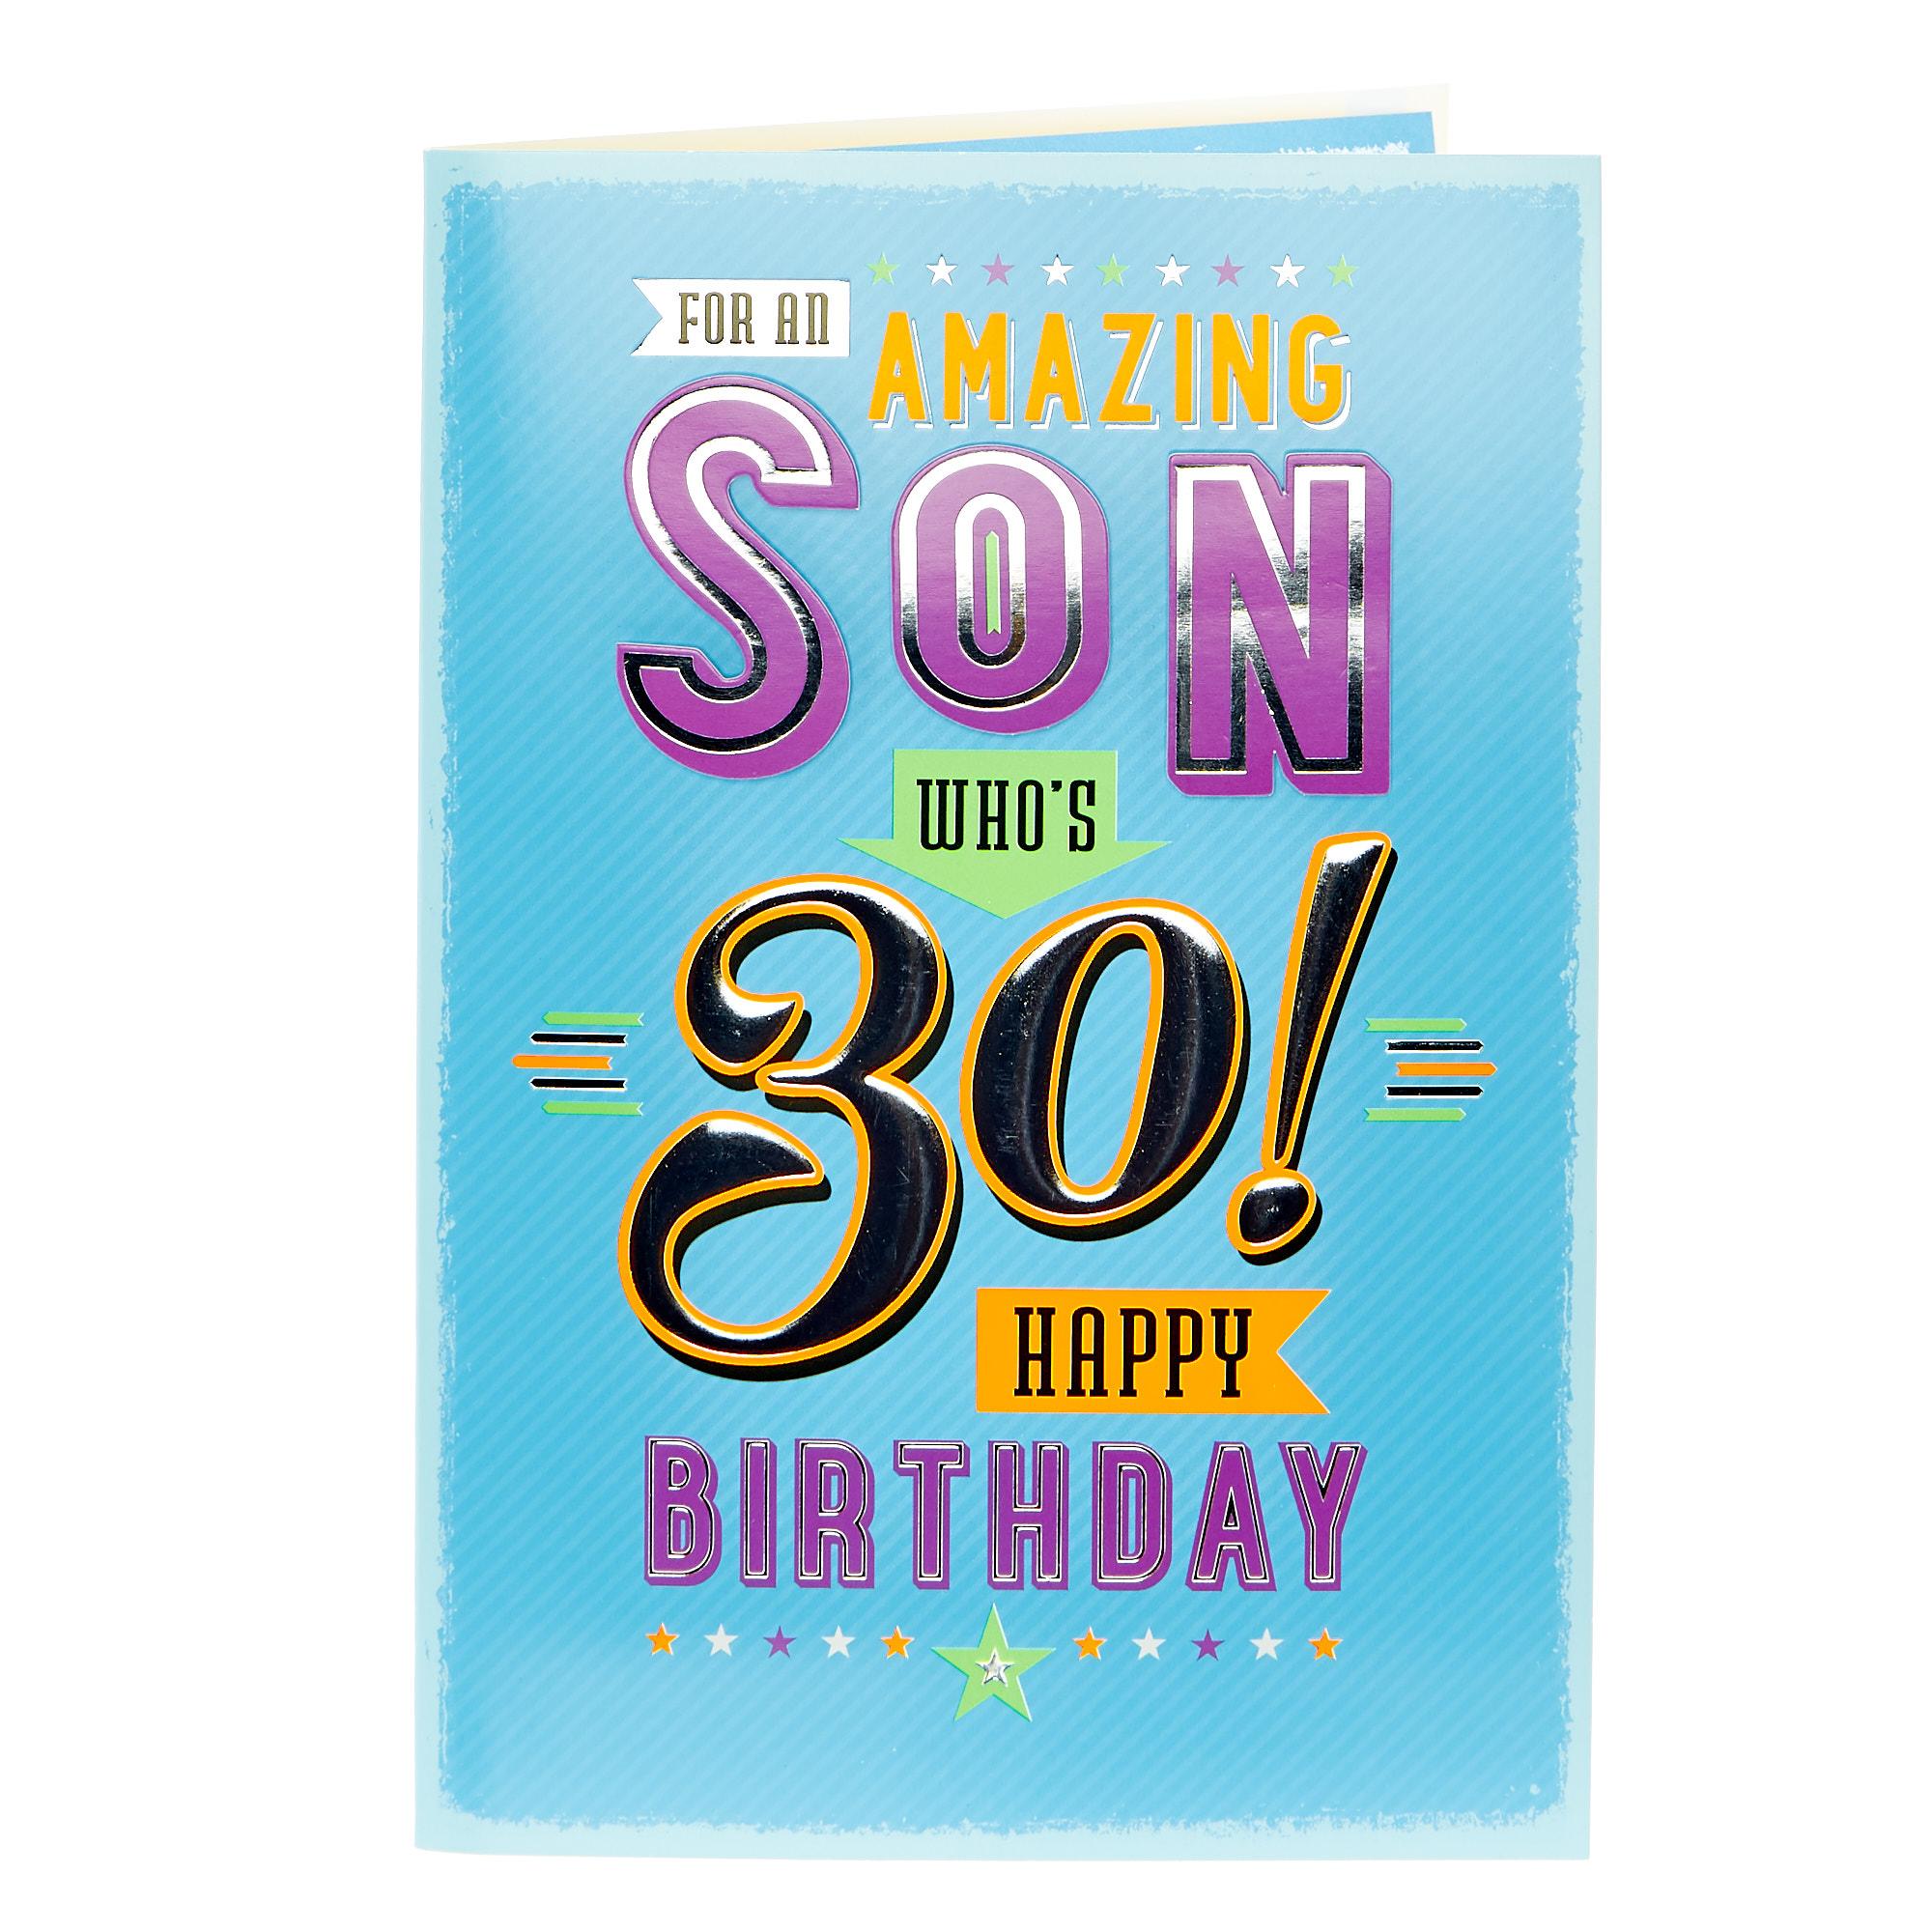 Happy Birthday 30th Son